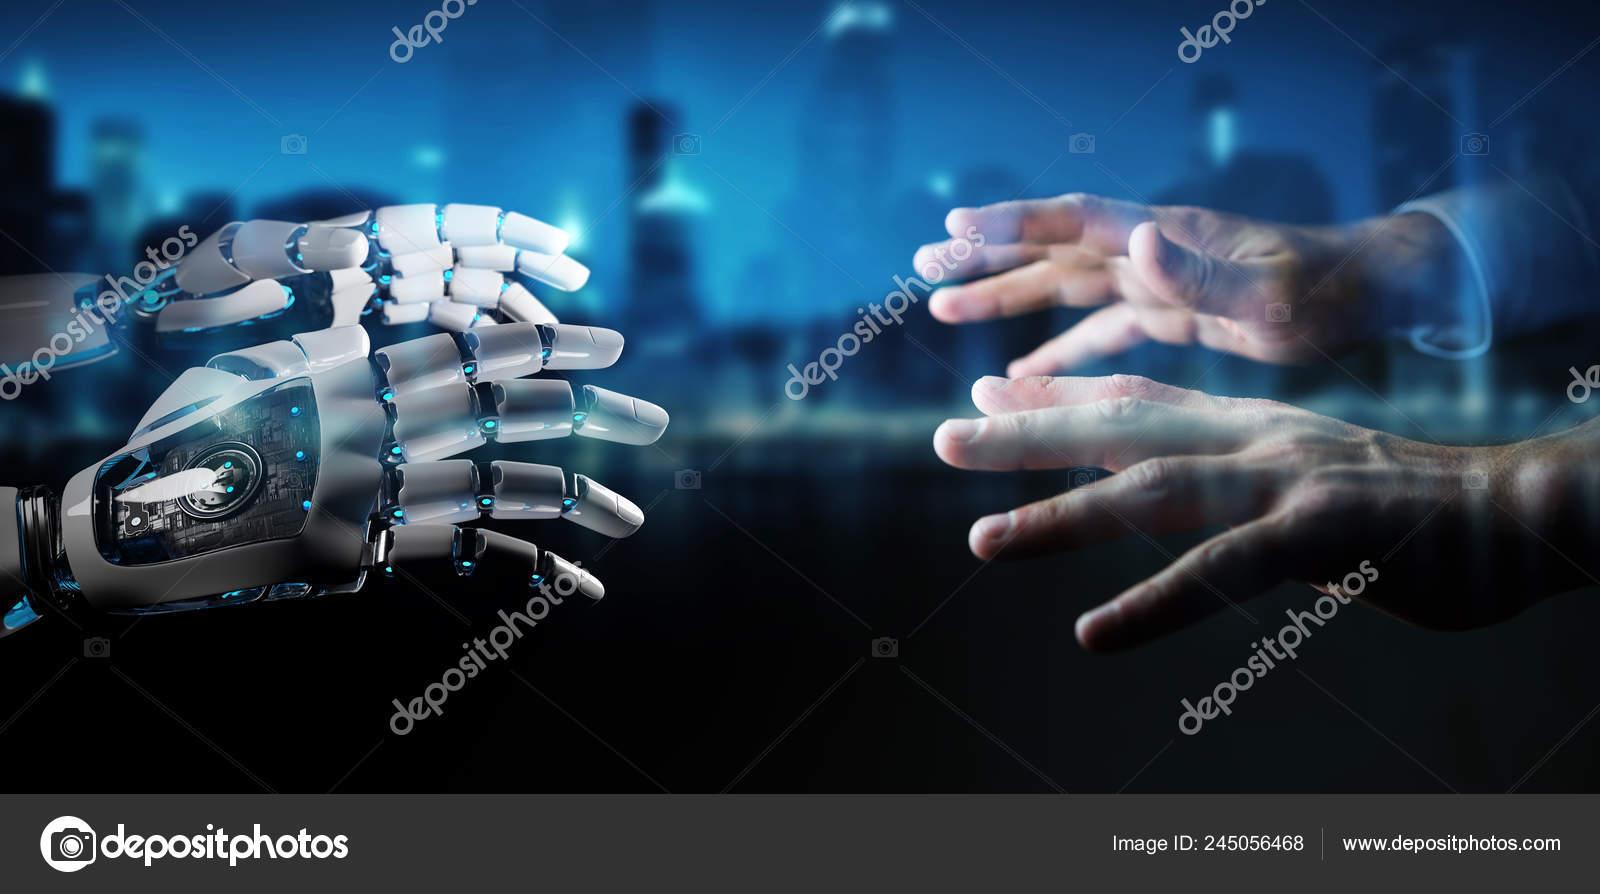 Robot Hand Making Contact Human Hand Dark Background